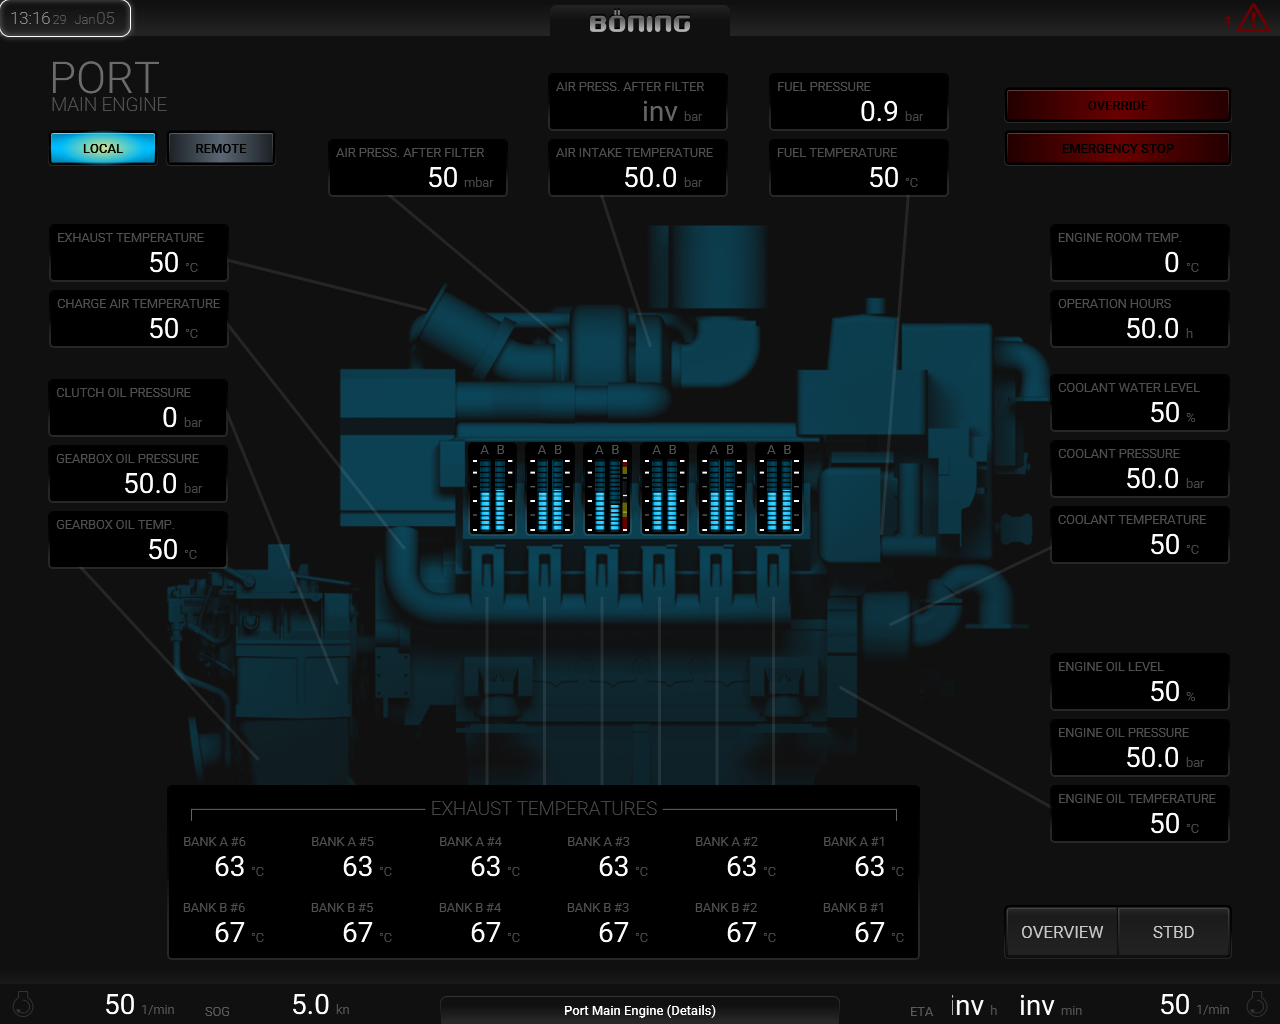 Port Main Engine (Details)